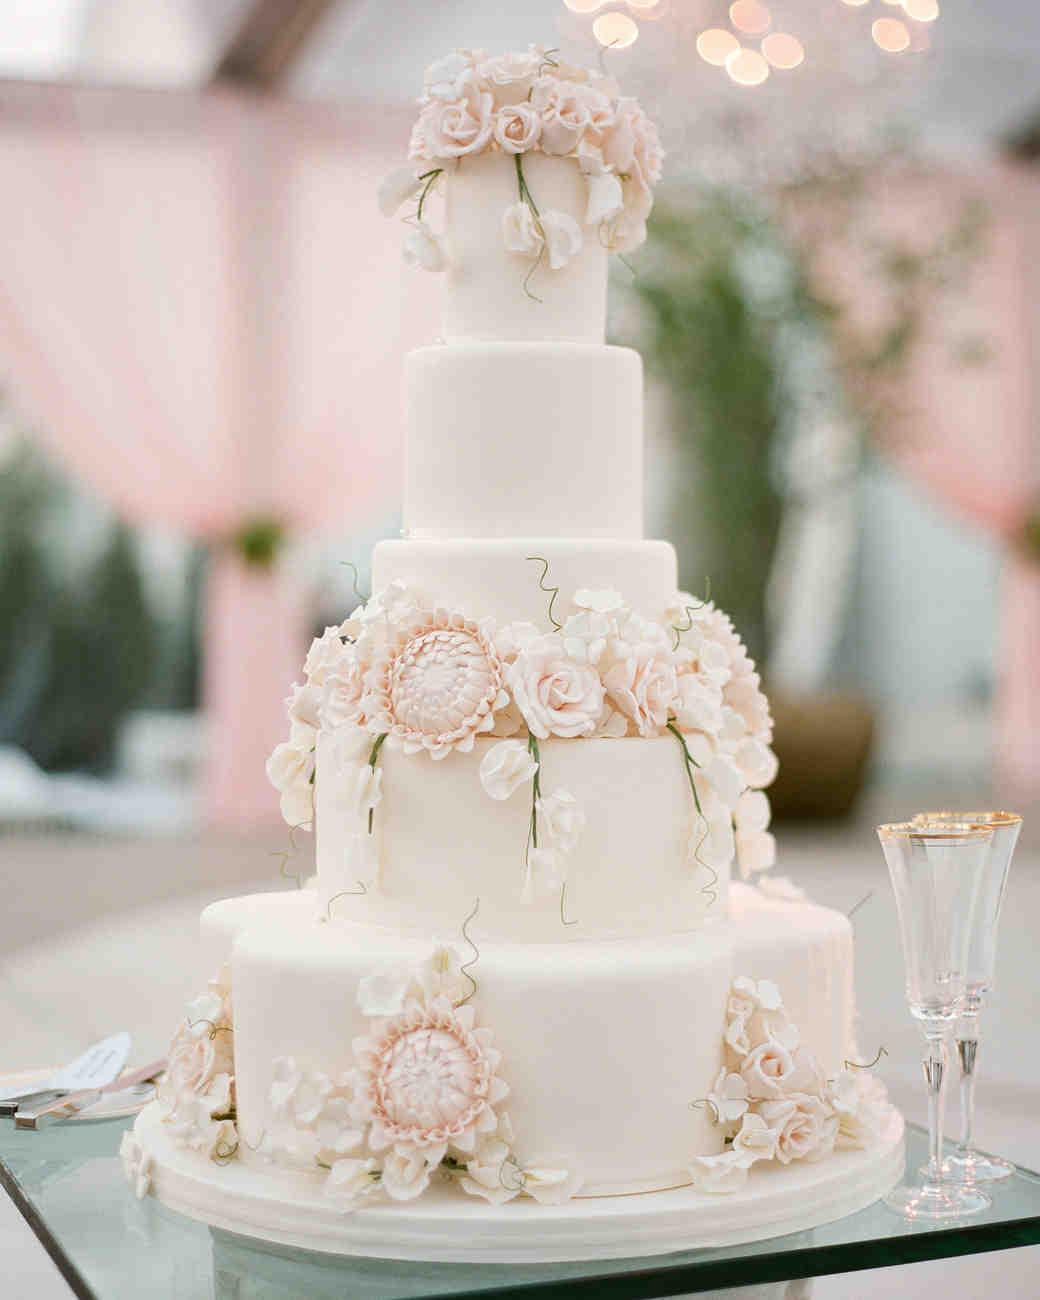 Images Of Wedding Cakes  7 Delicious Vegan Wedding Cakes